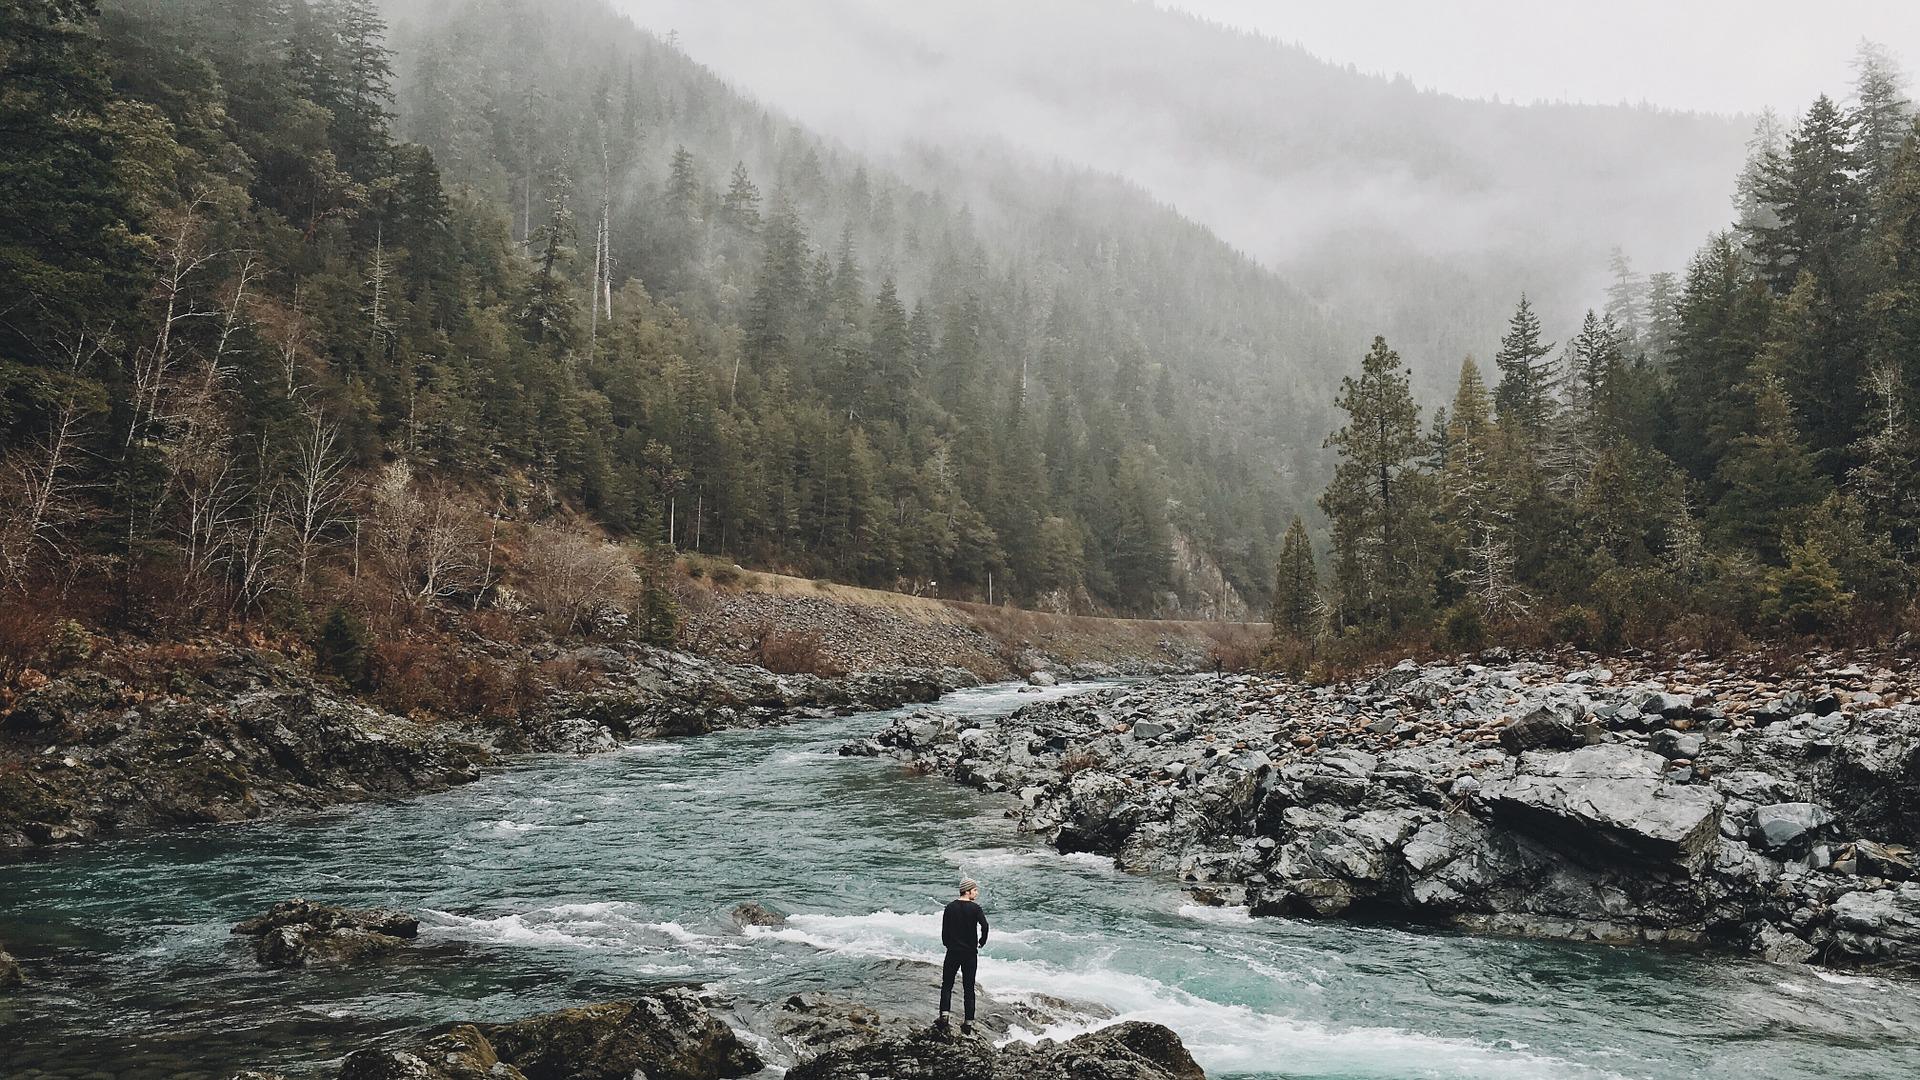 Man in River